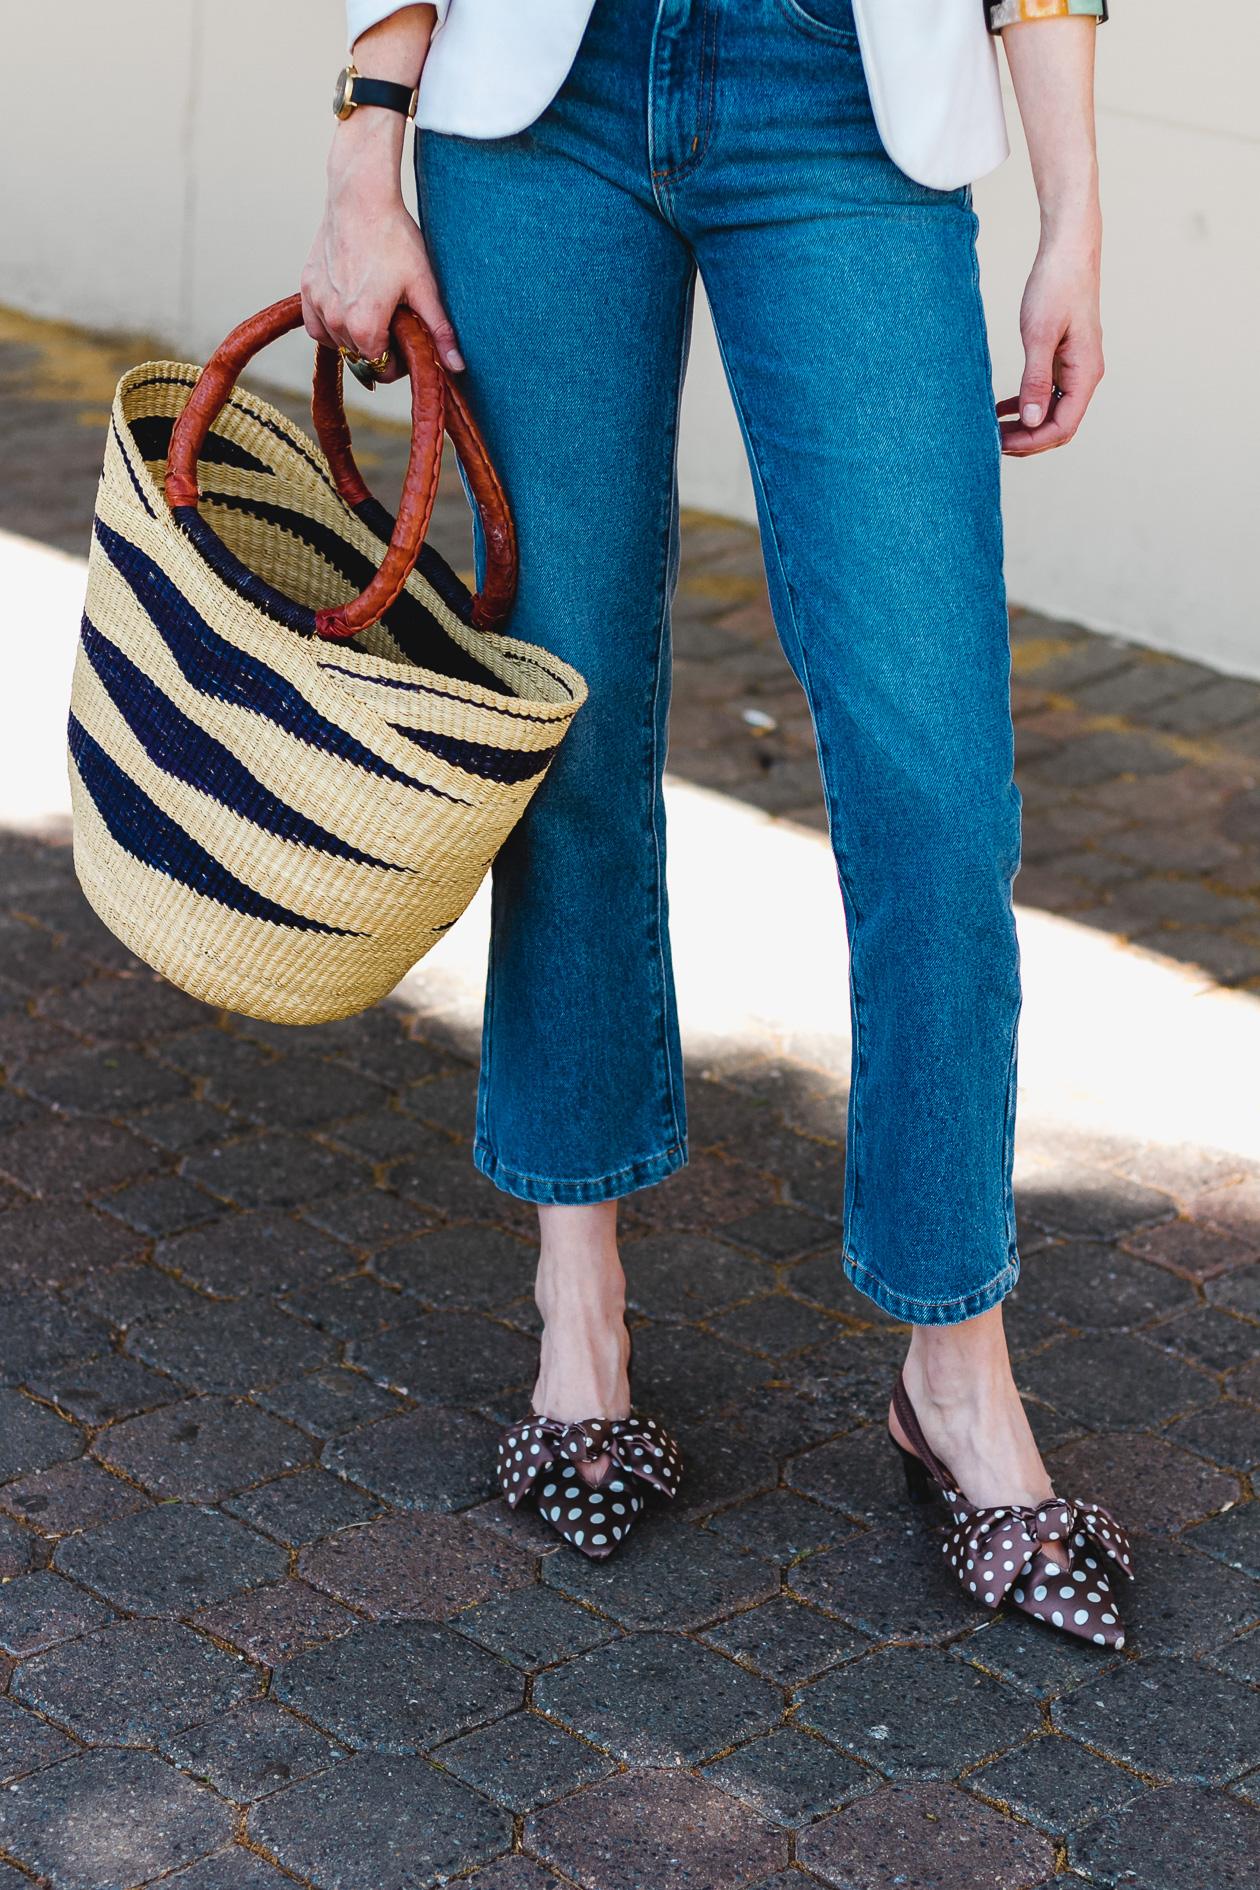 Need Supply jeans and polka dot pumps